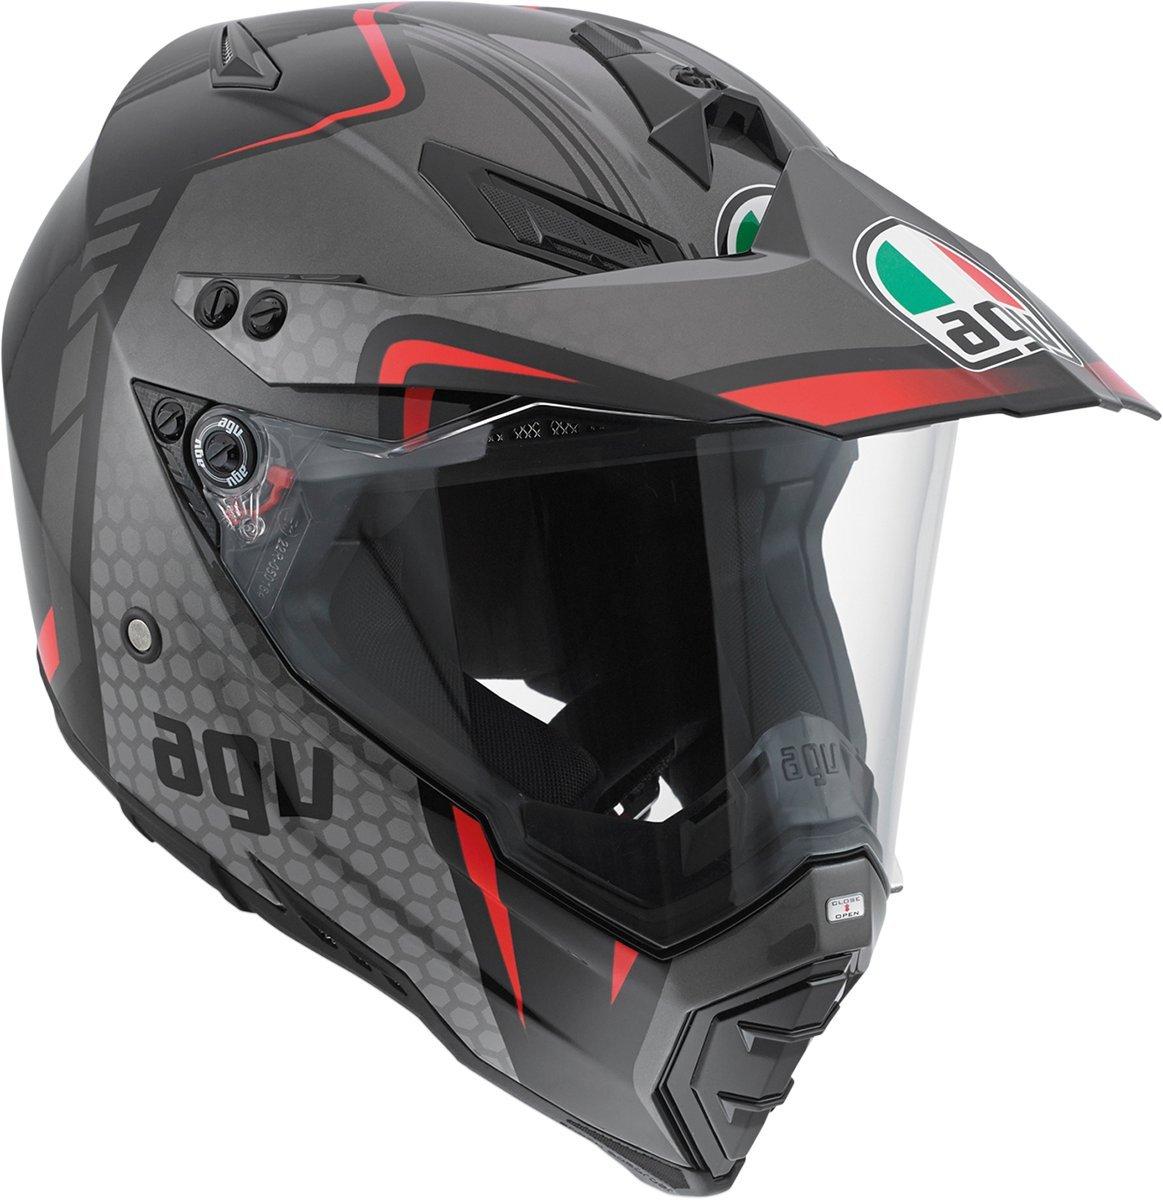 AGV AX-8 Dual Sport Evo Helmet (Black/Silver/Red, Medium)